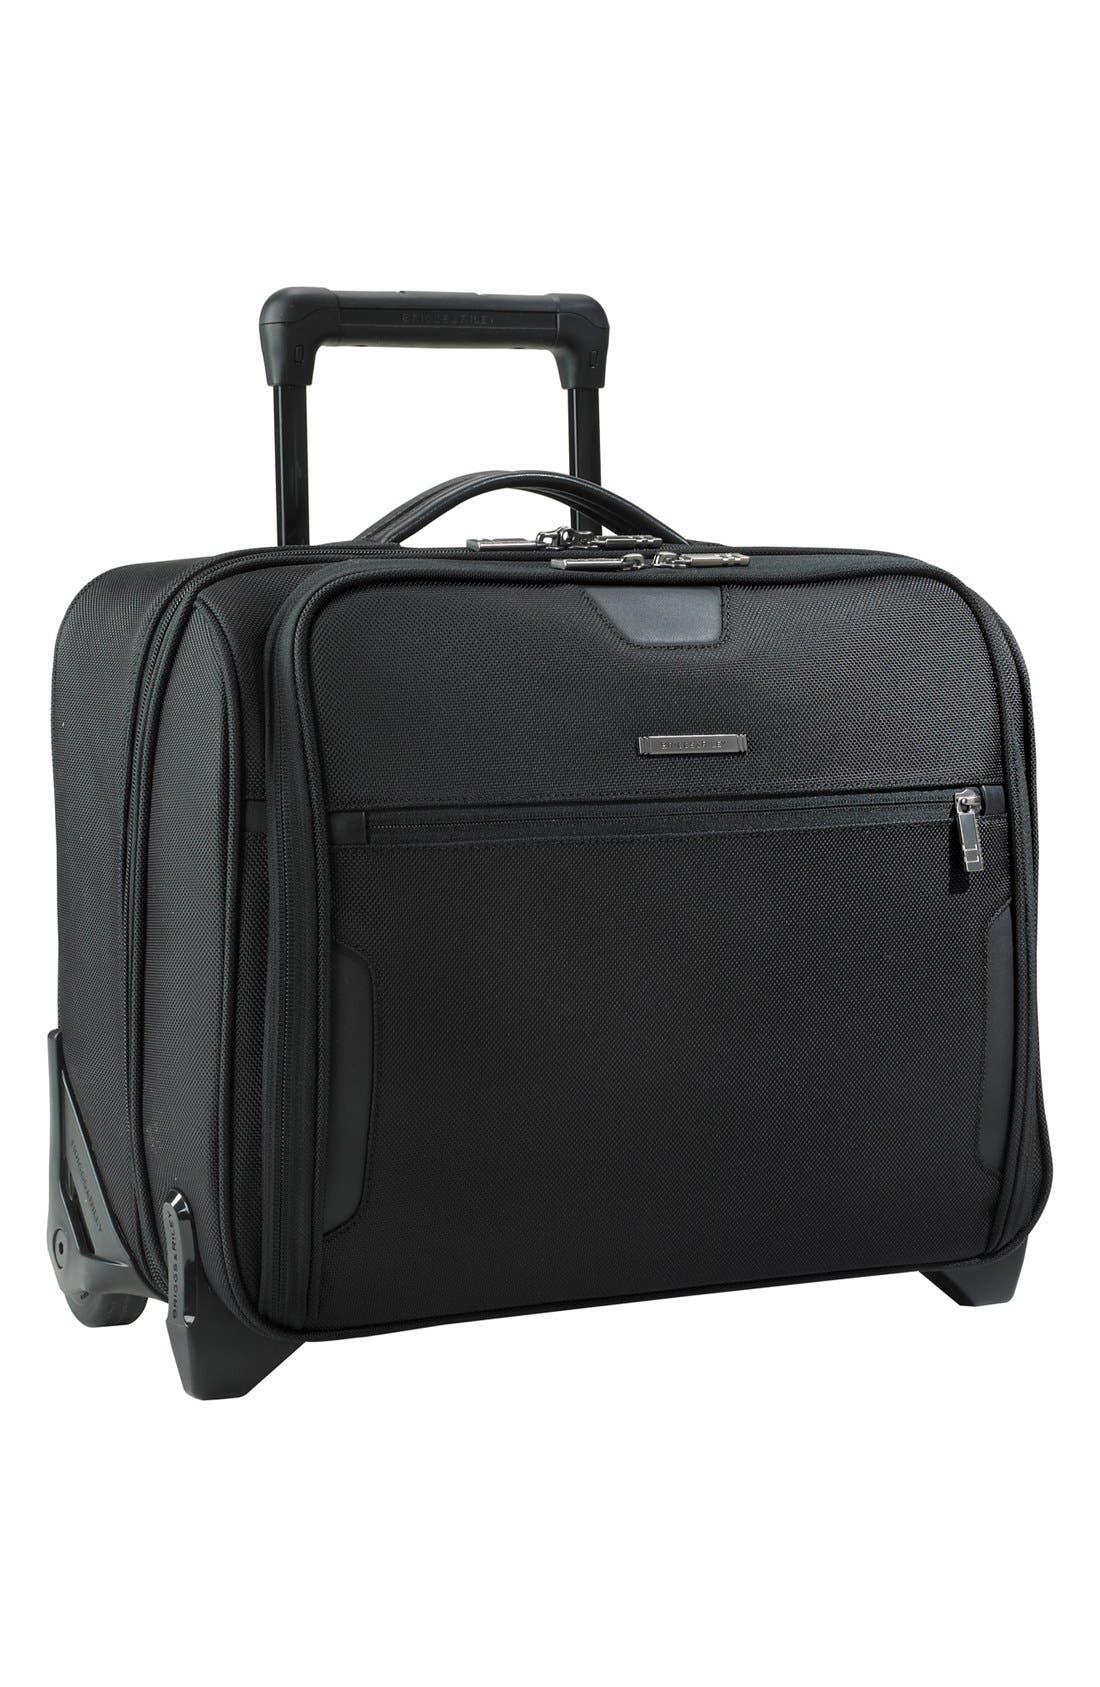 Alternate Image 1 Selected - Briggs & Riley 'Medium Slim' Rolling Ballistic Nylon Briefcase (16 Inch)